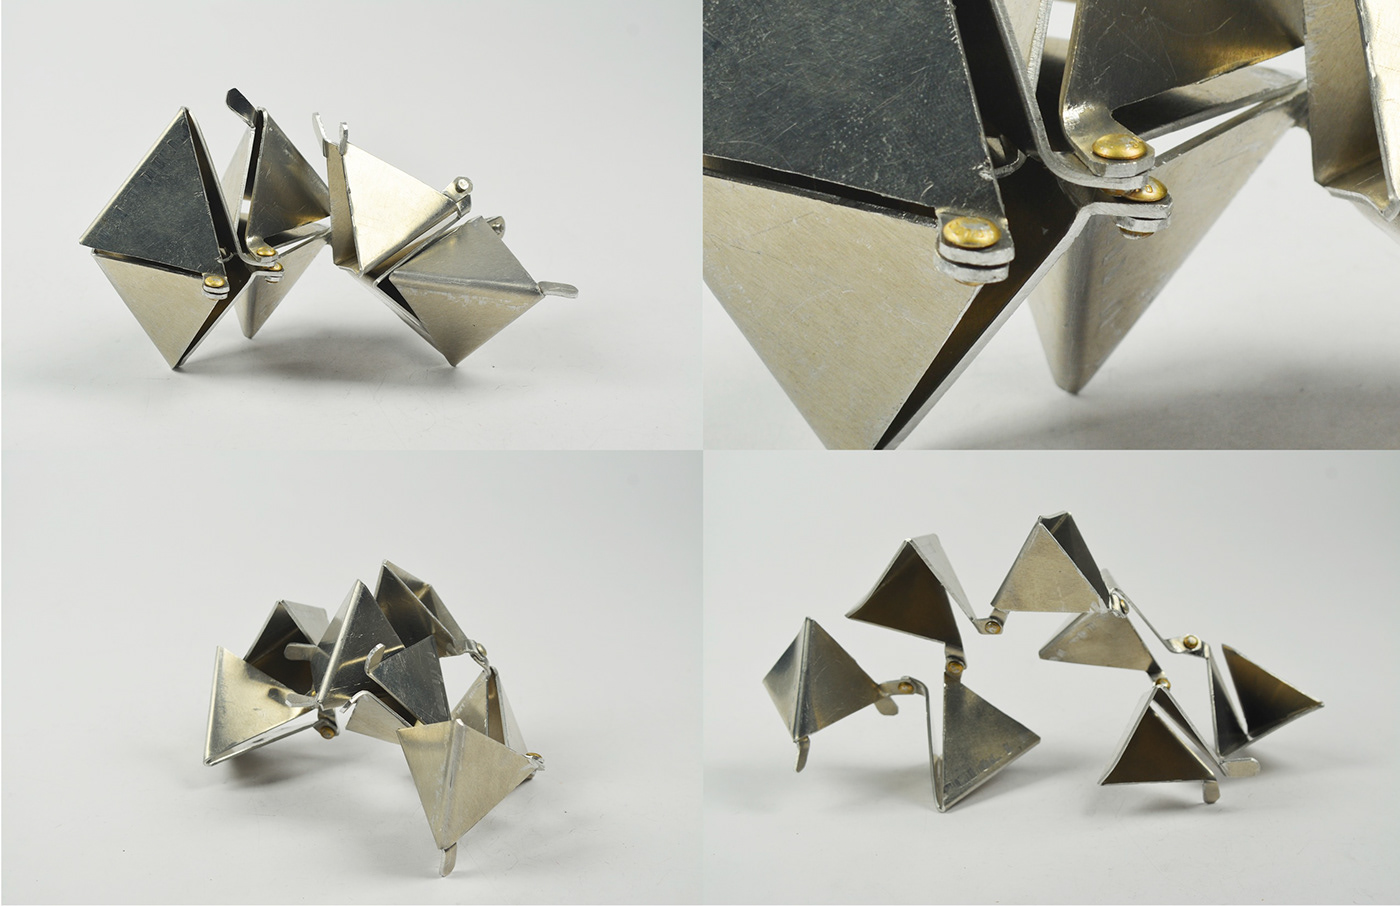 metal aluminum sculpture Metals 1 risd geometry